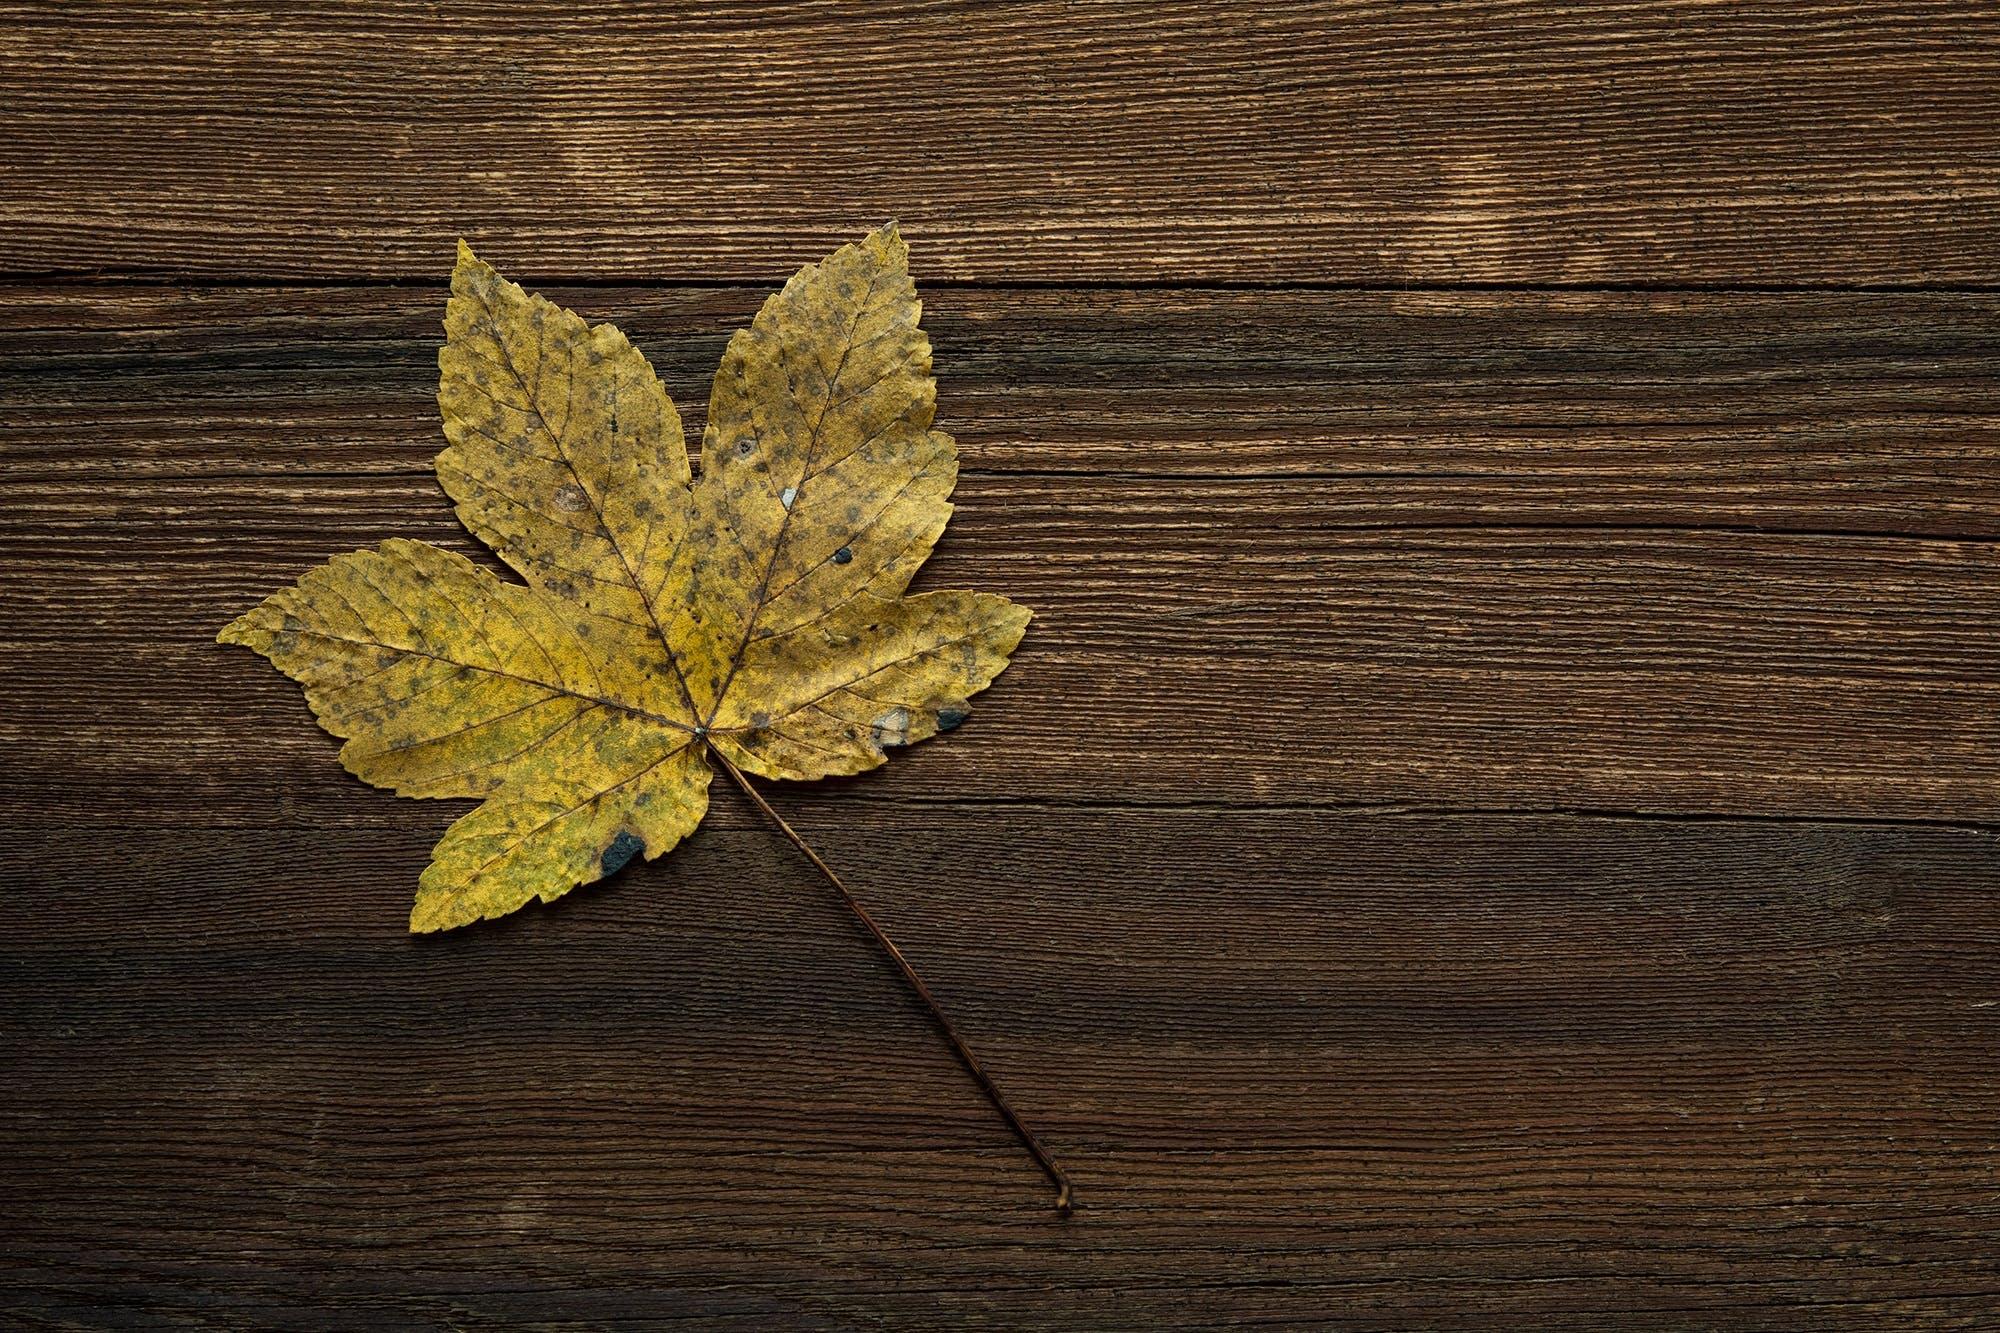 HD wallpaper, leaf, table